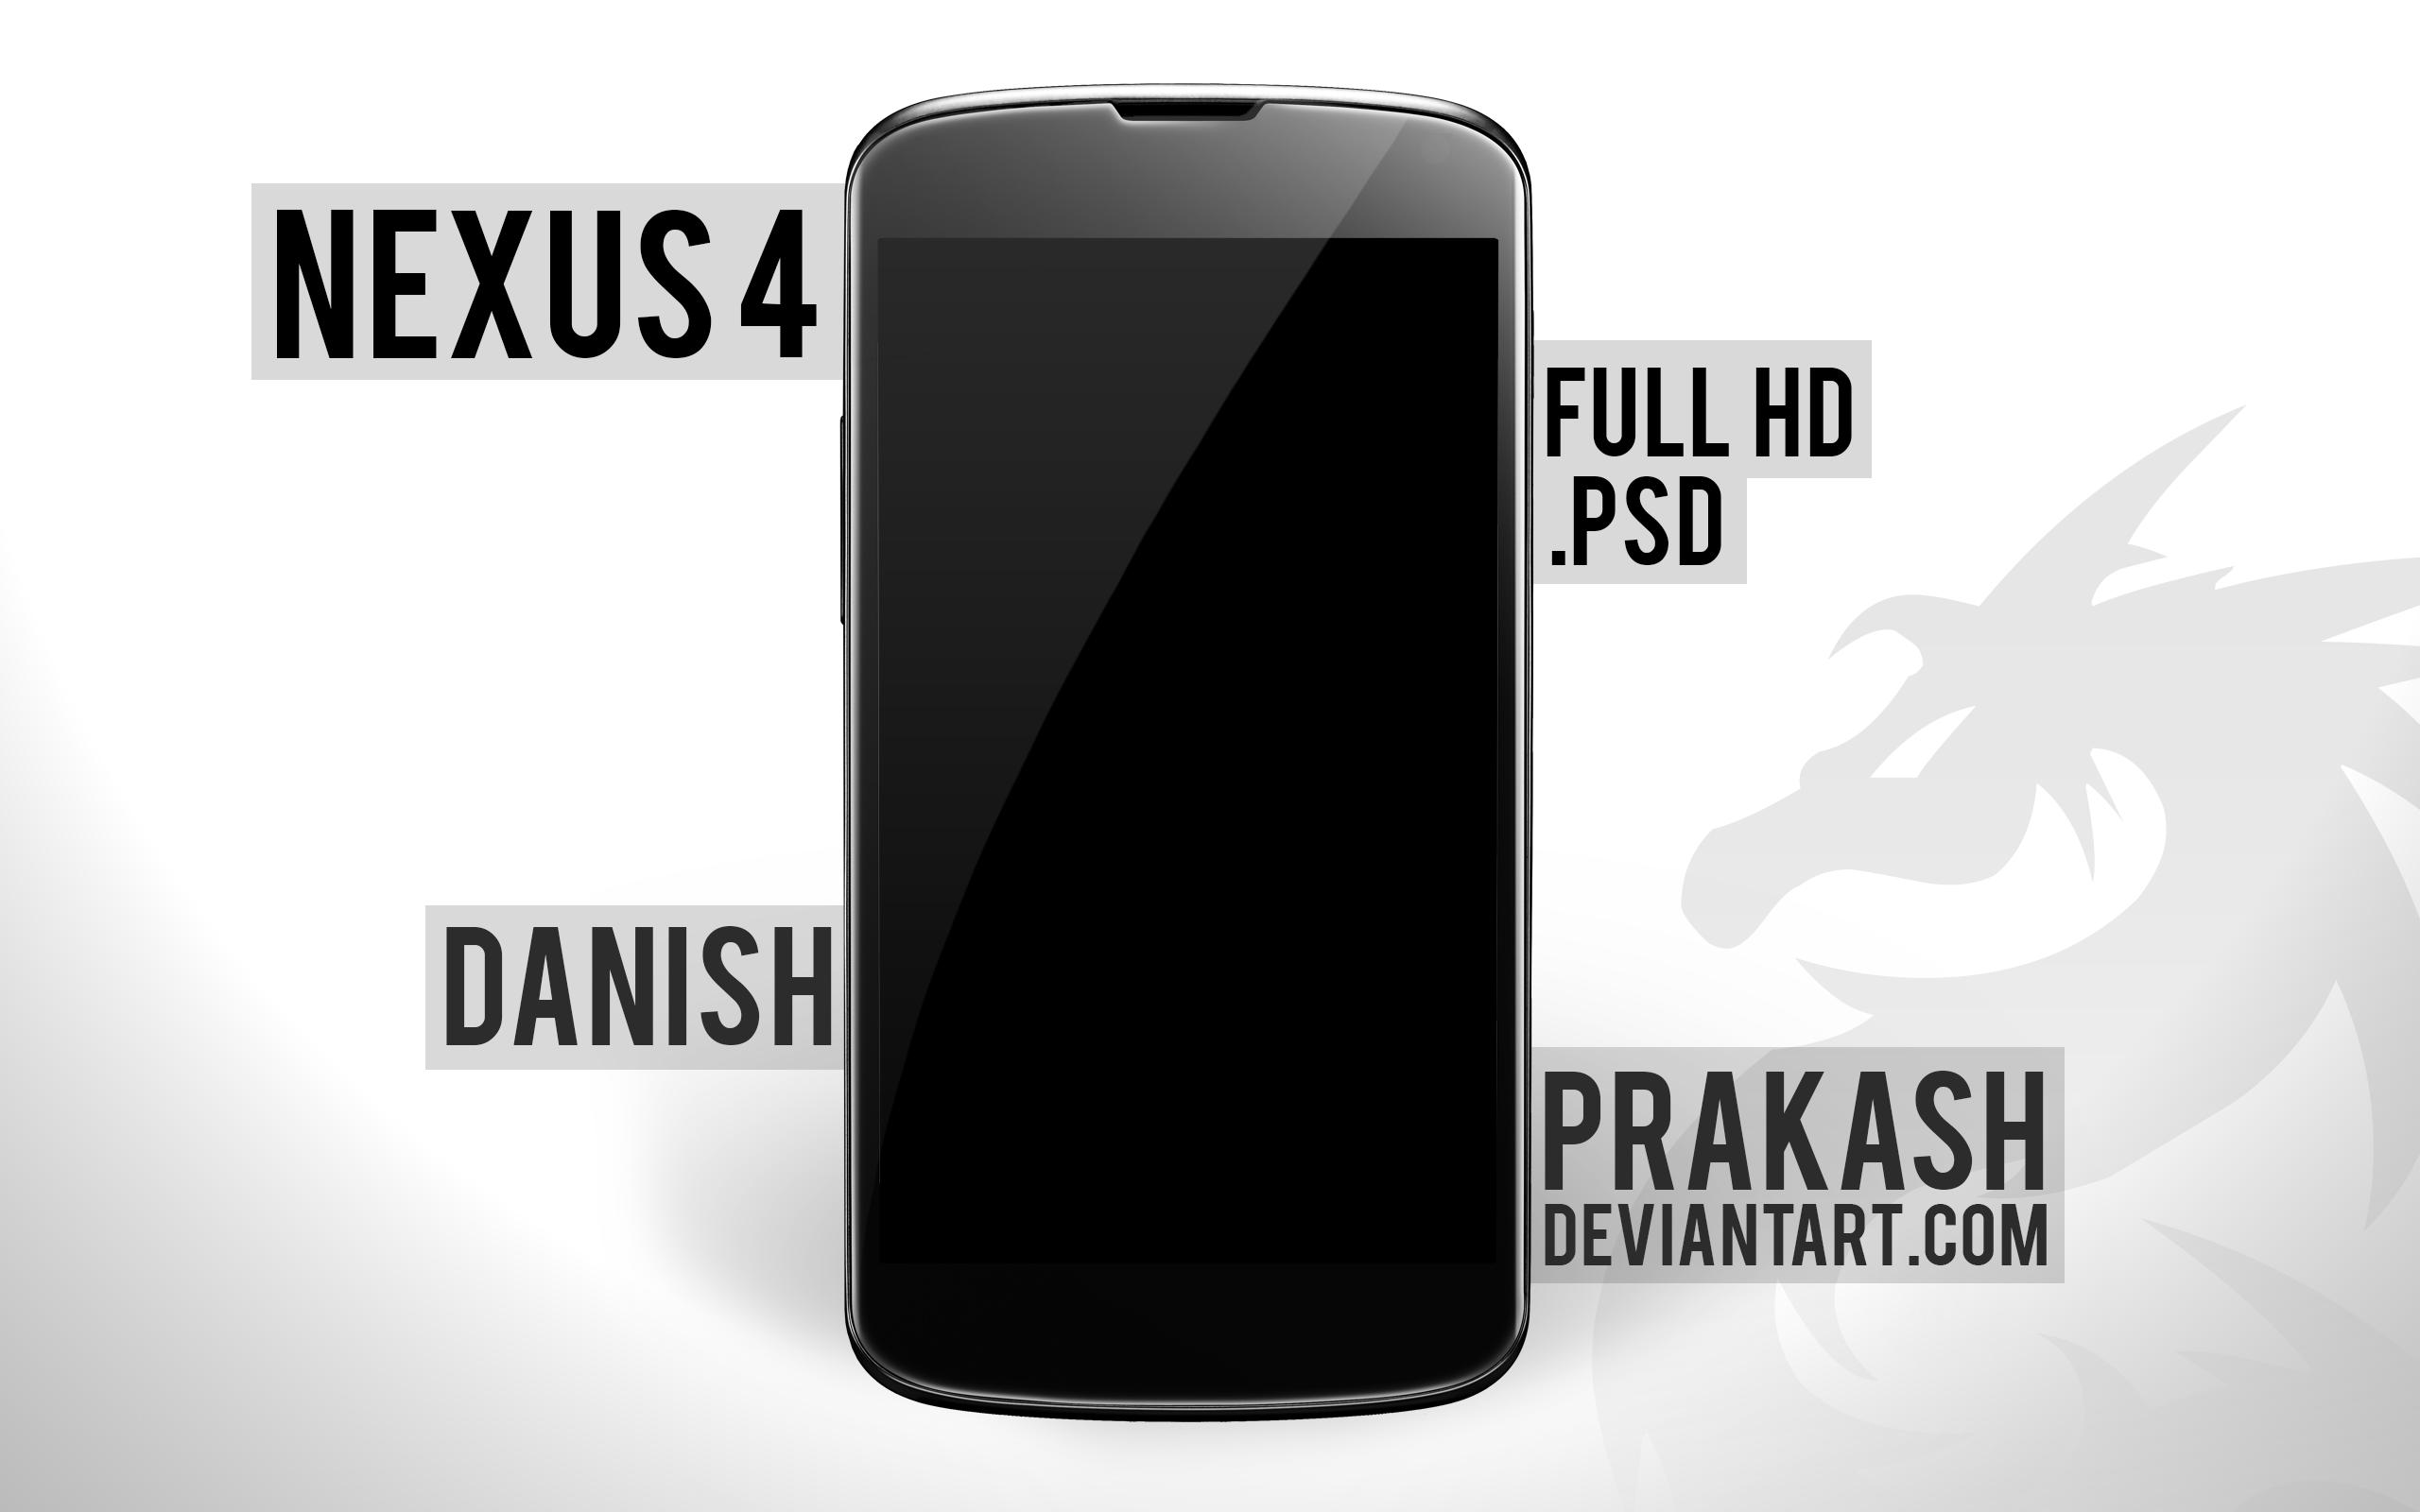 LG Nexus 4 PSD by danishprakash